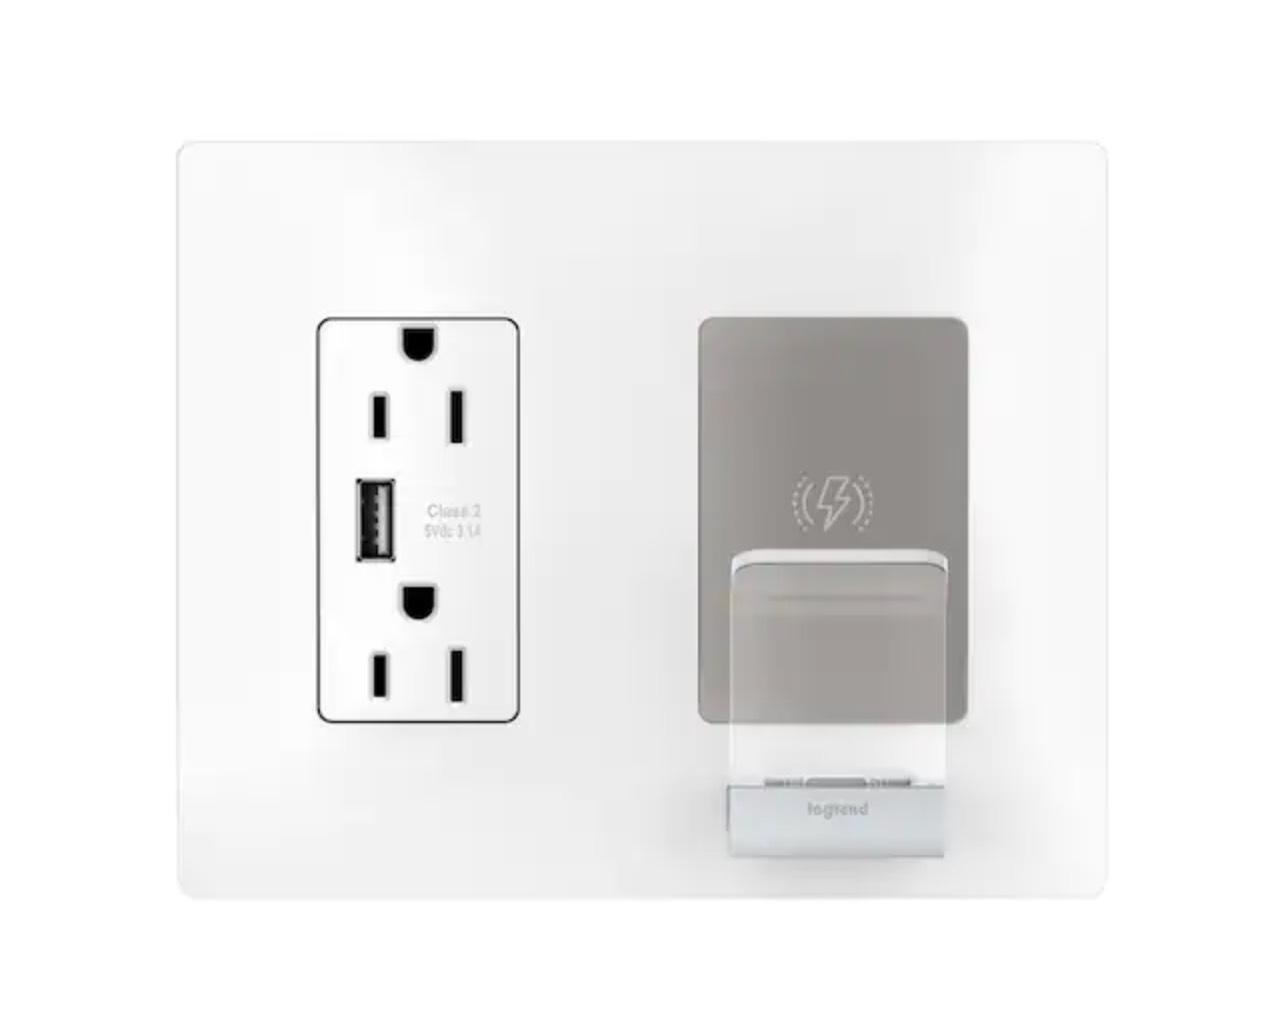 legrand-radiant-wireless-charger-resized.jpg